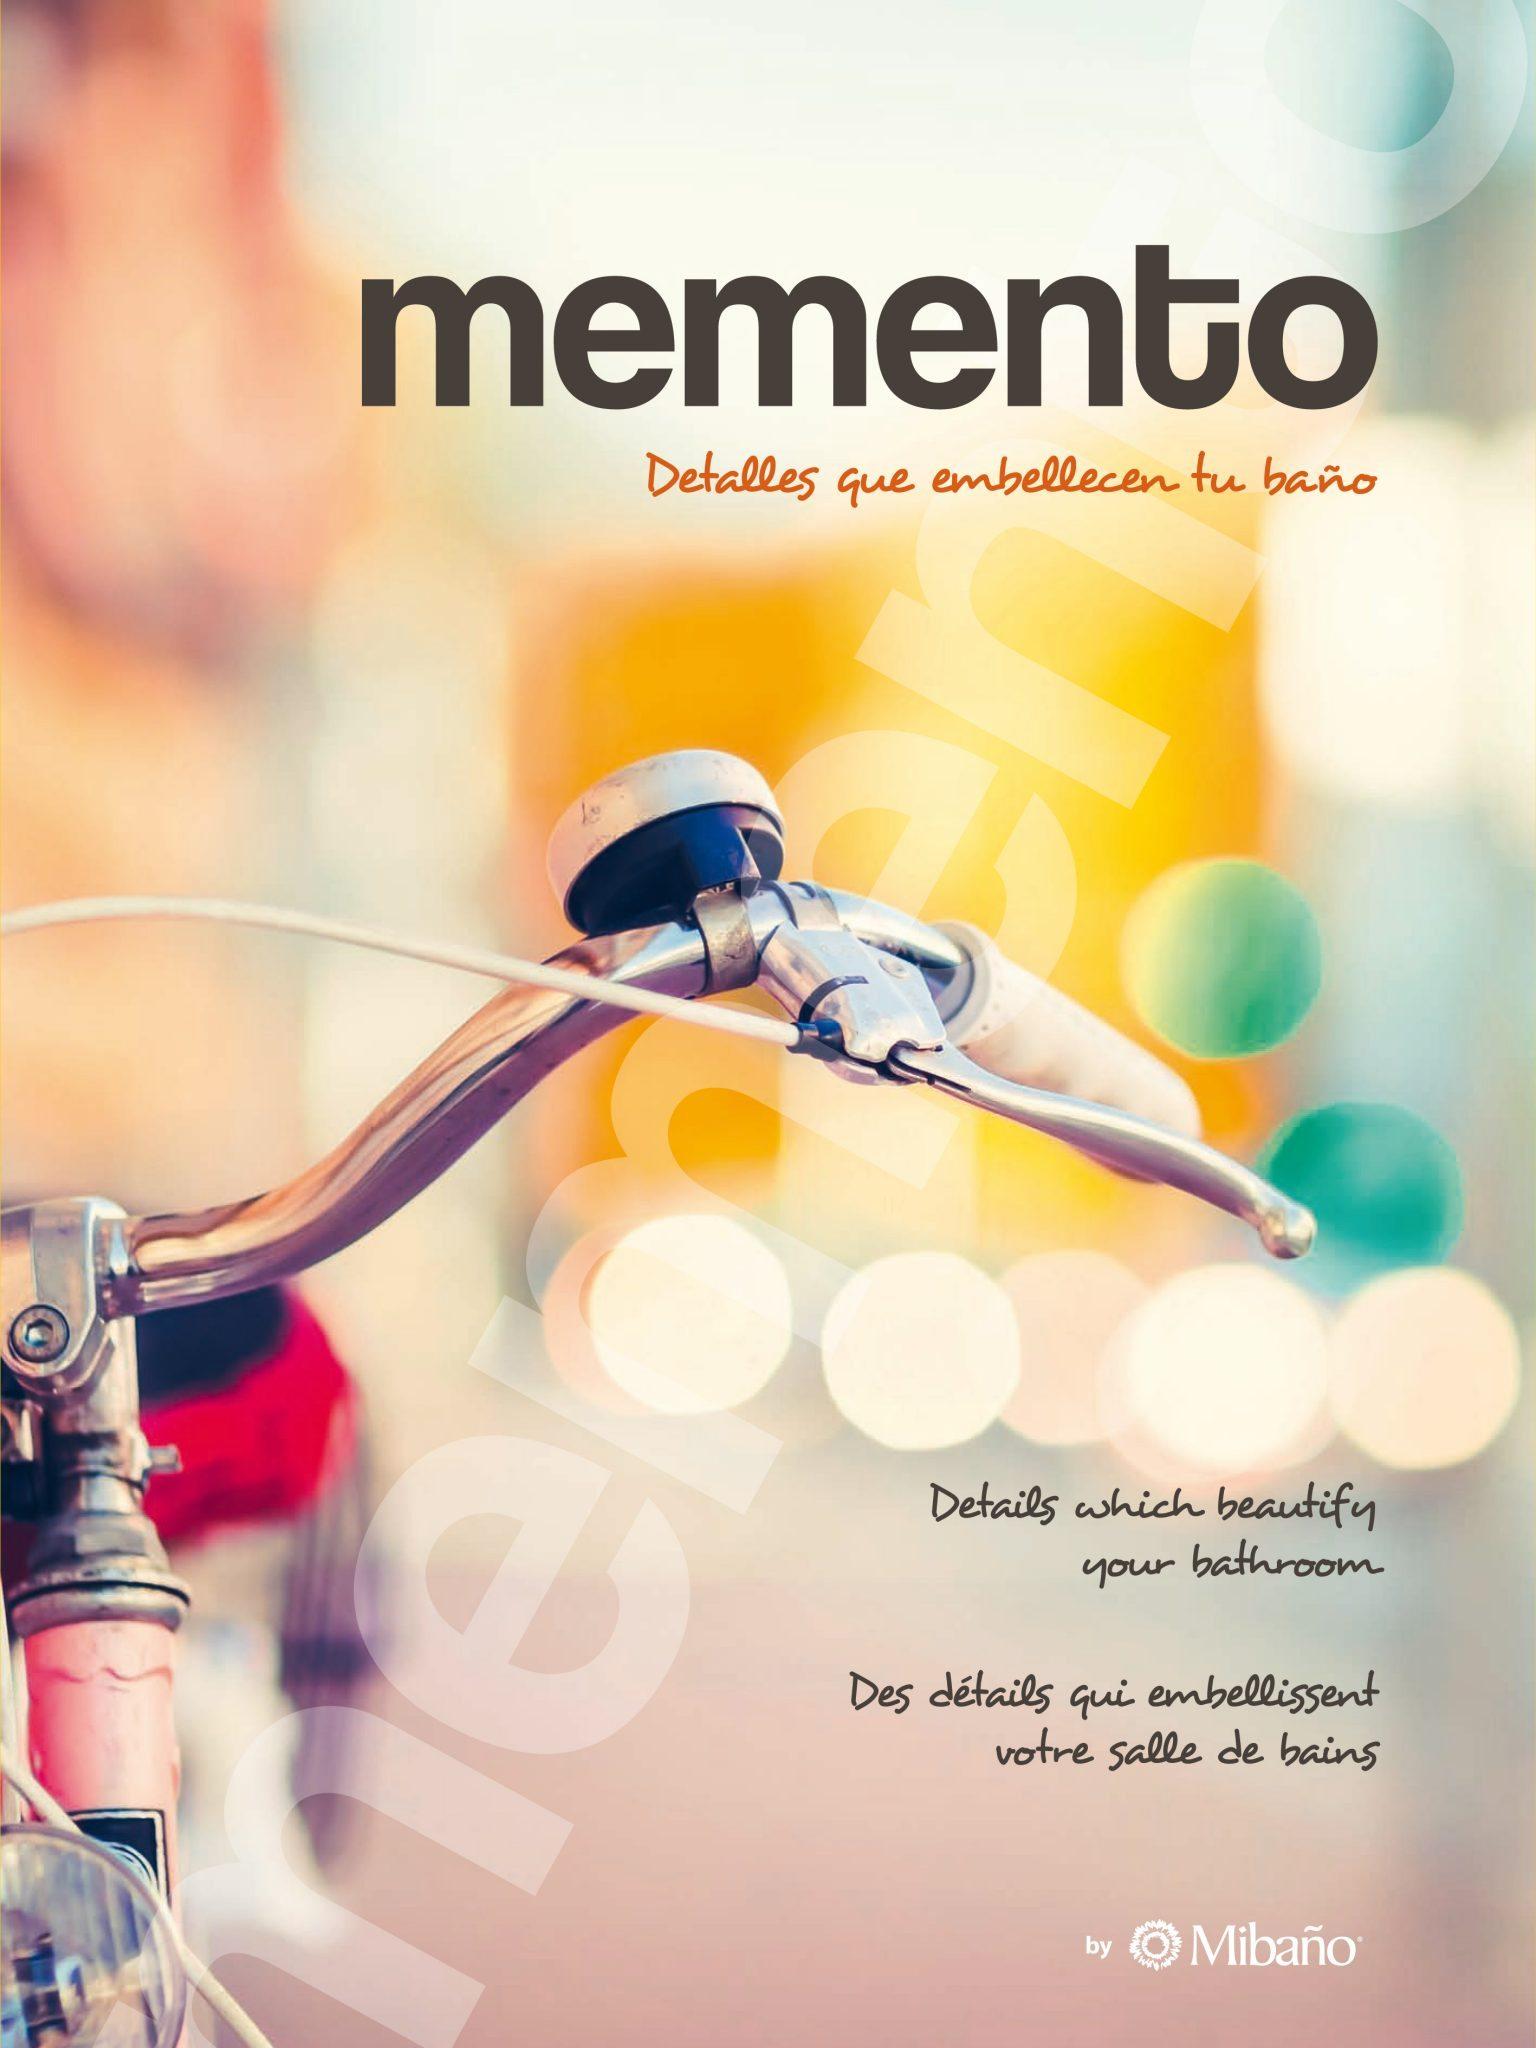 New Collection Memento Mibano Grupo Mogar # Muebles Memento